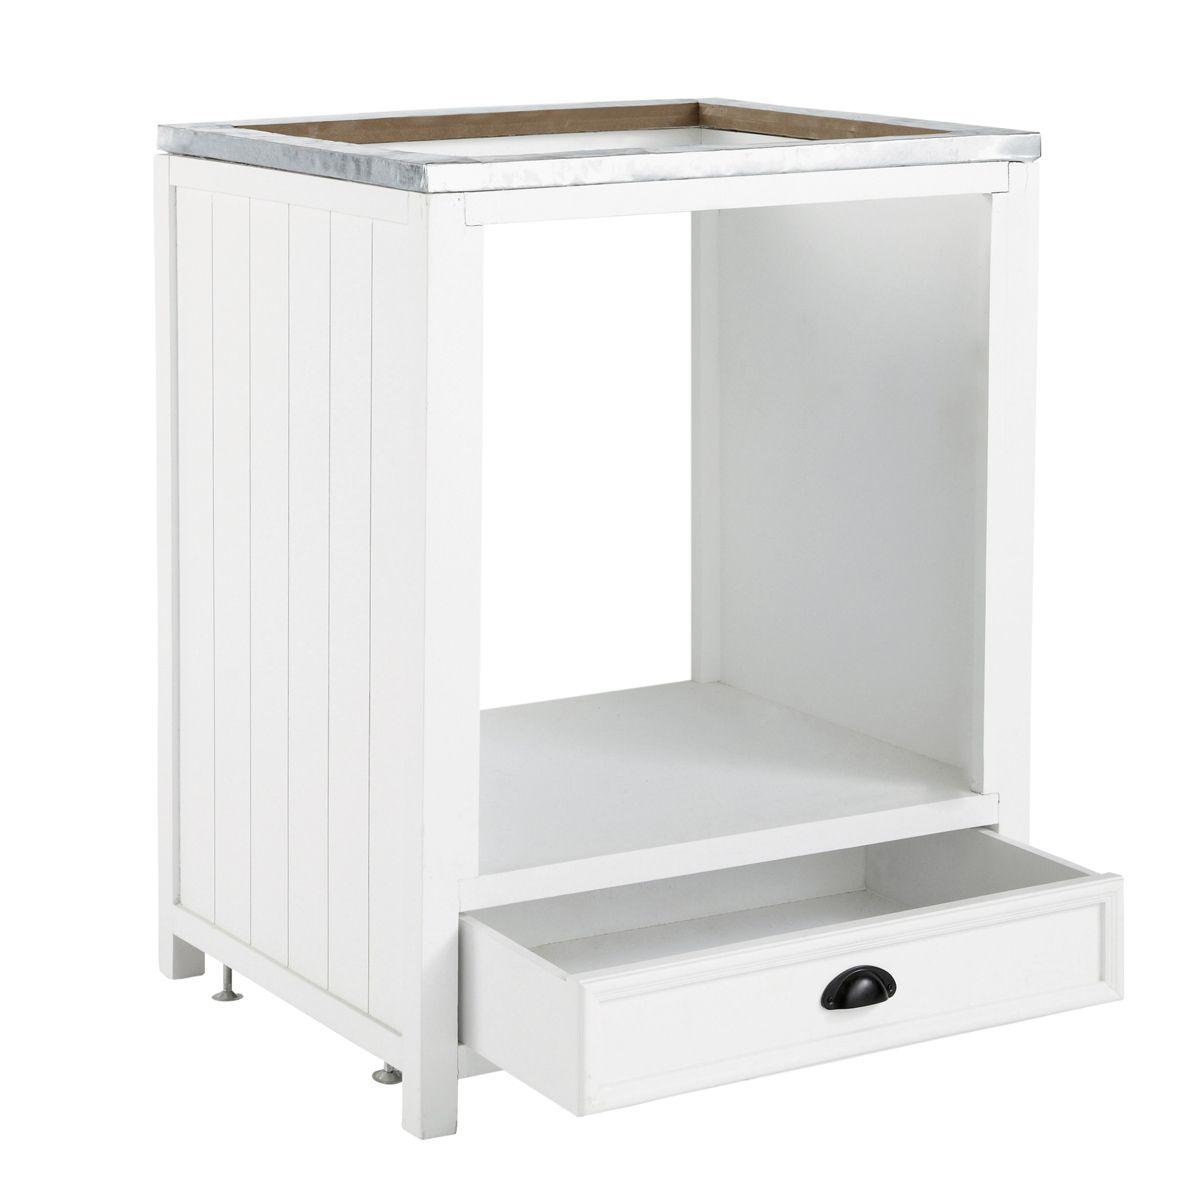 k chenunterschrank wei. Black Bedroom Furniture Sets. Home Design Ideas